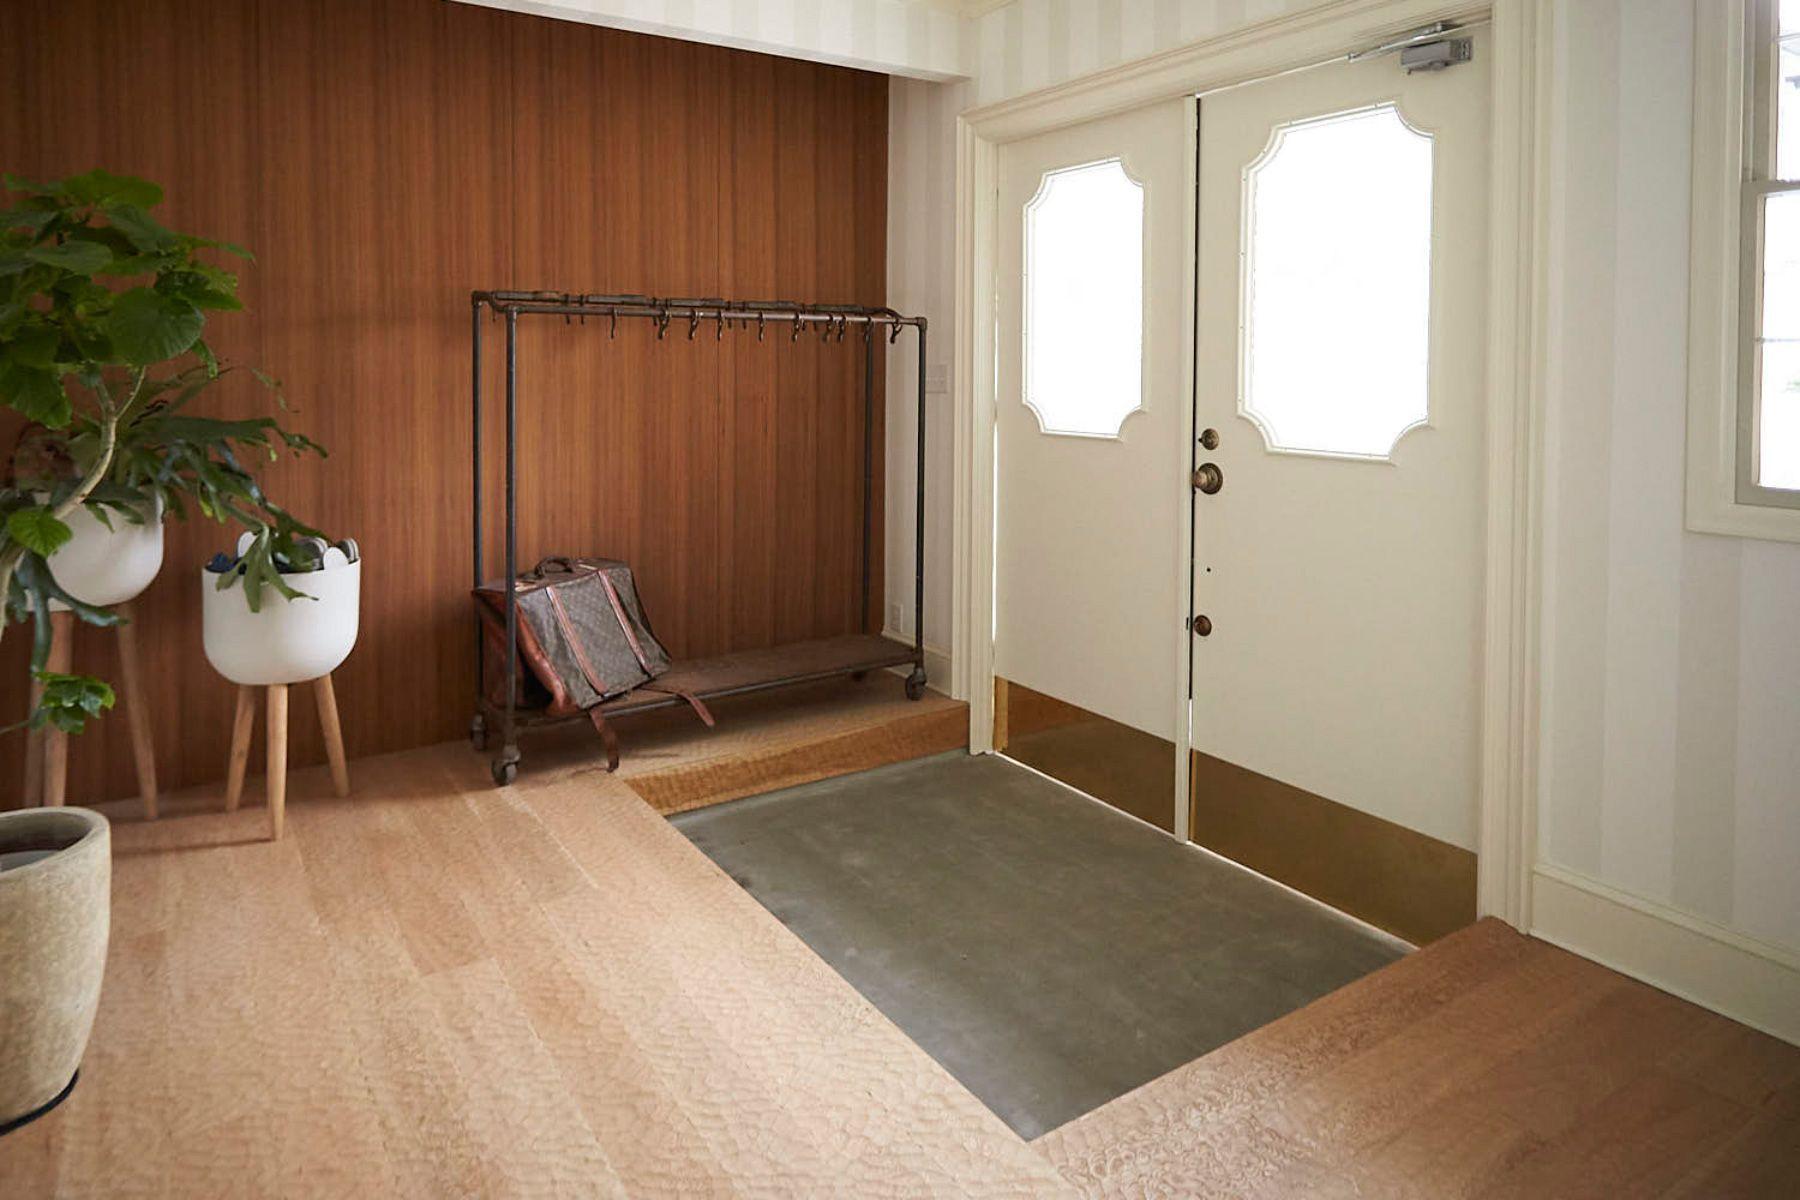 luumu.tokyo (ルウム トーキョー)1F 洗面